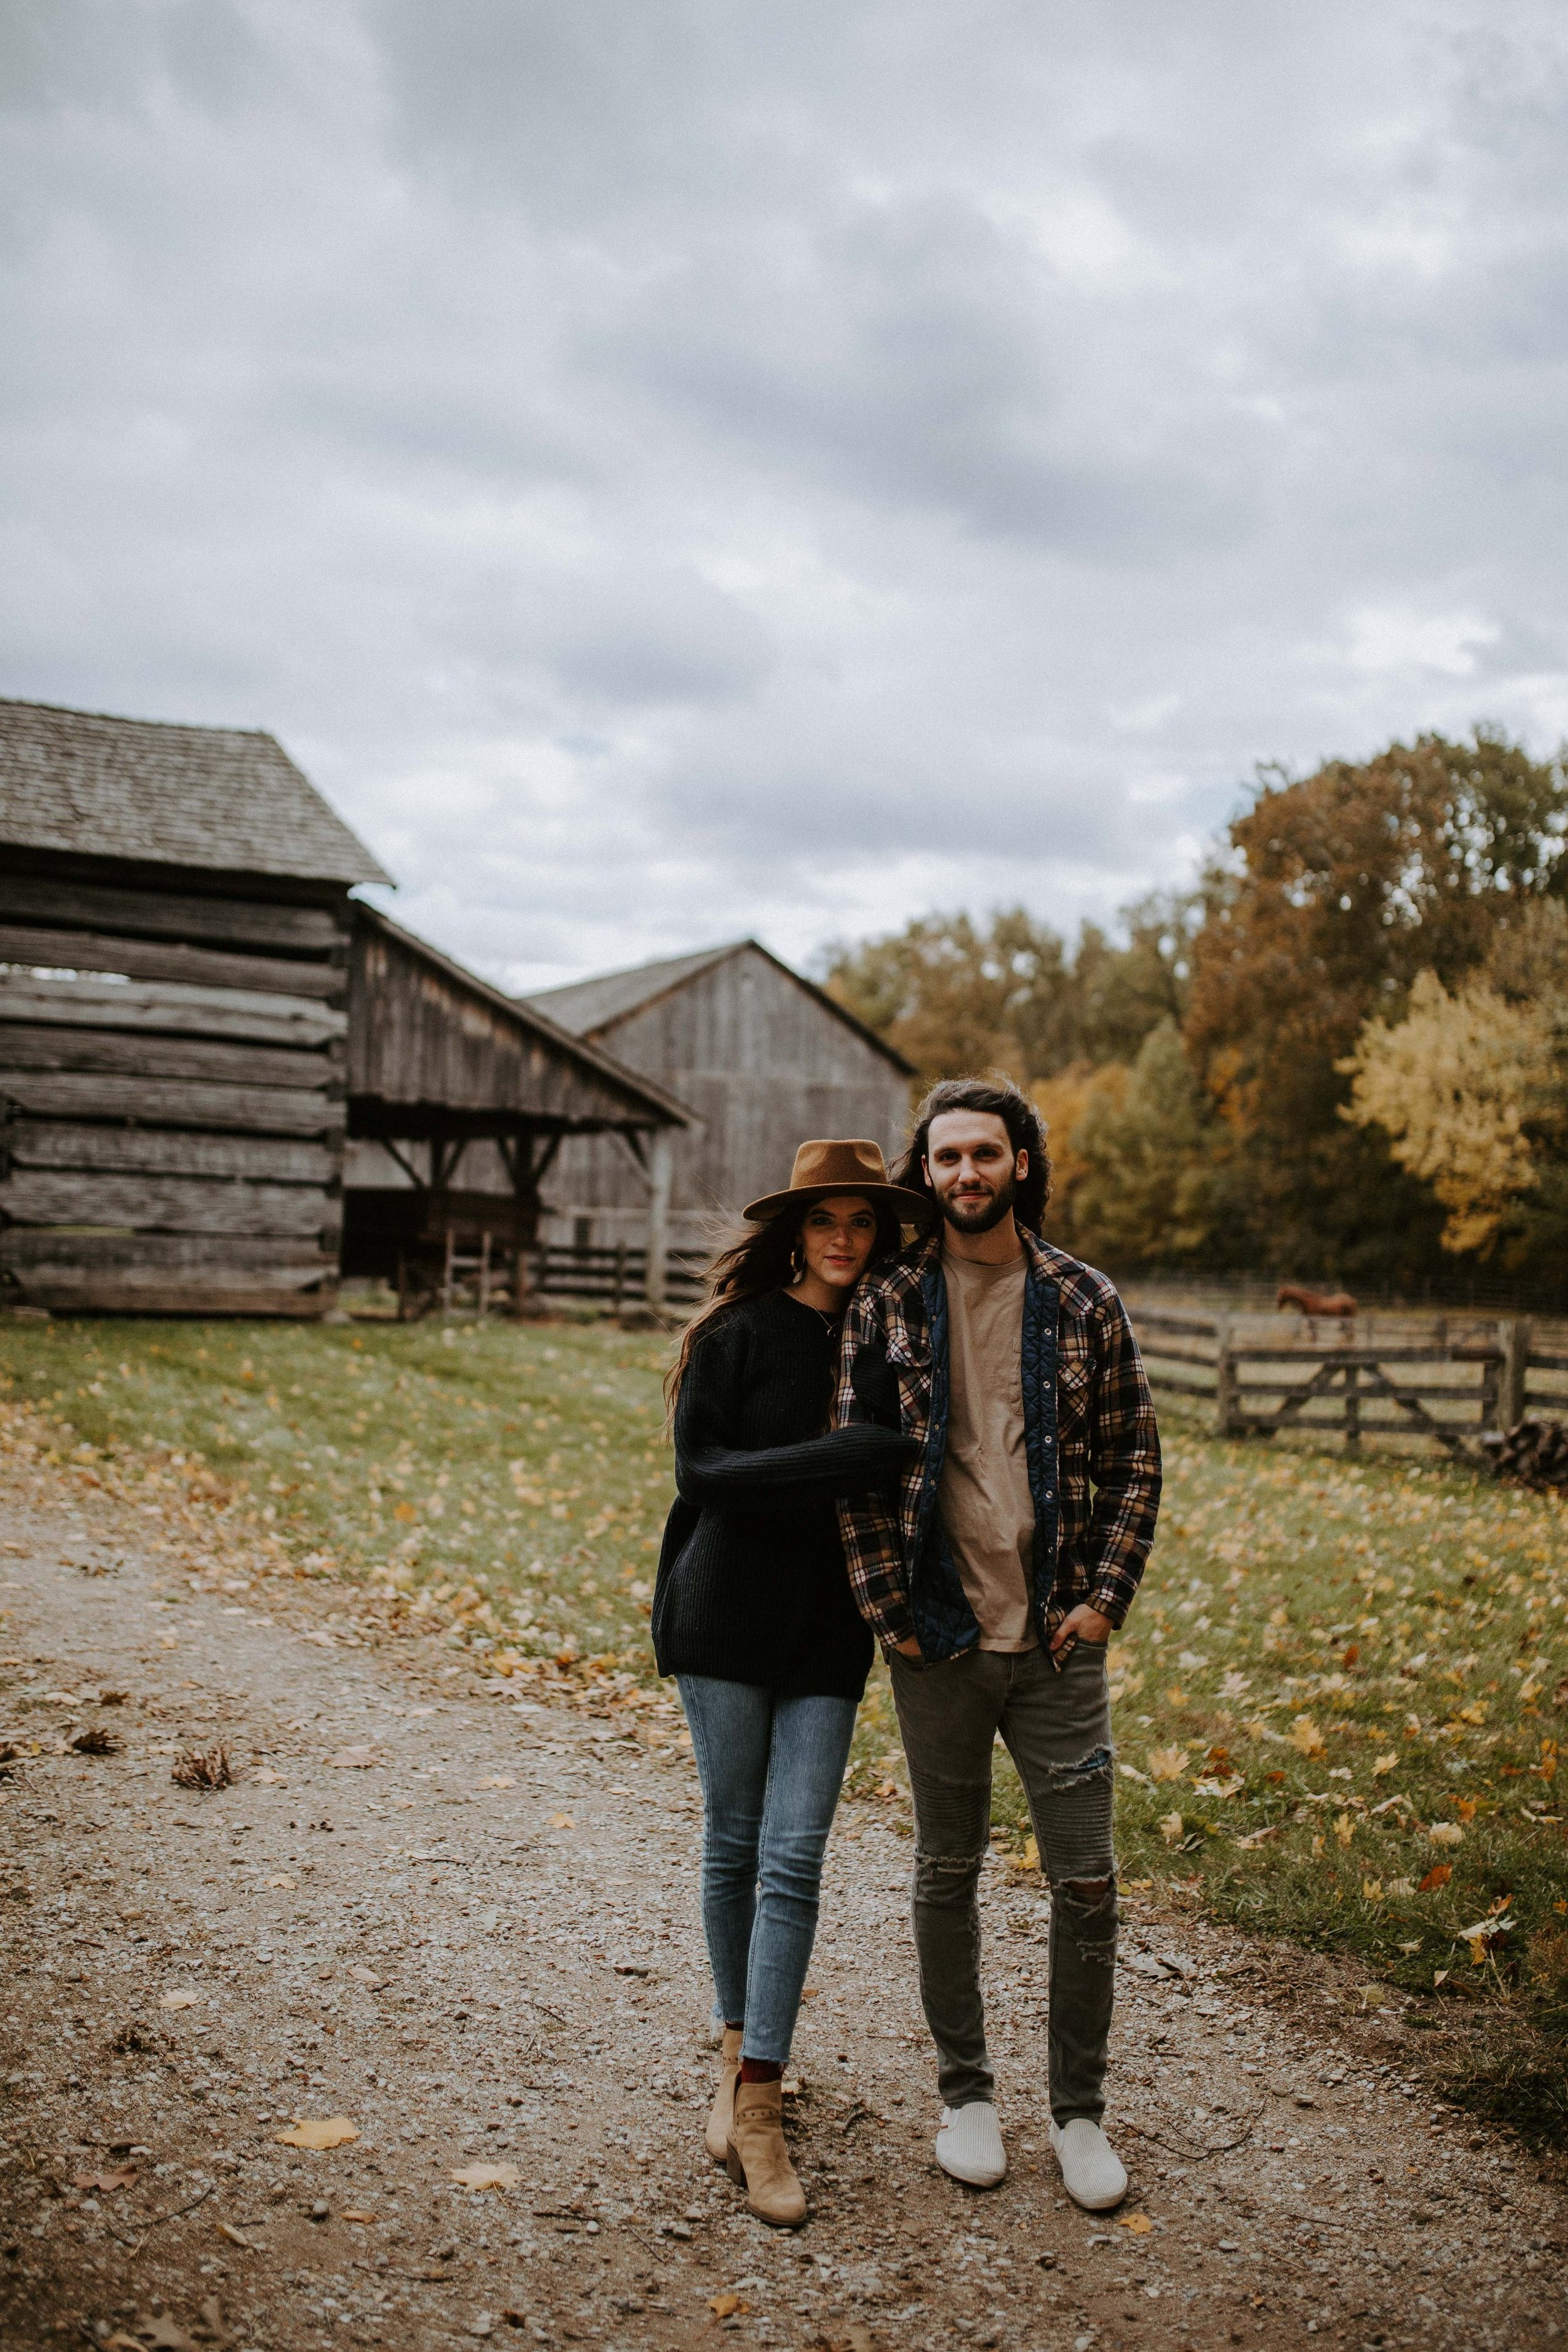 reaganlynnphotography-couplephotography-connerprairie-leximccracken23.jpg